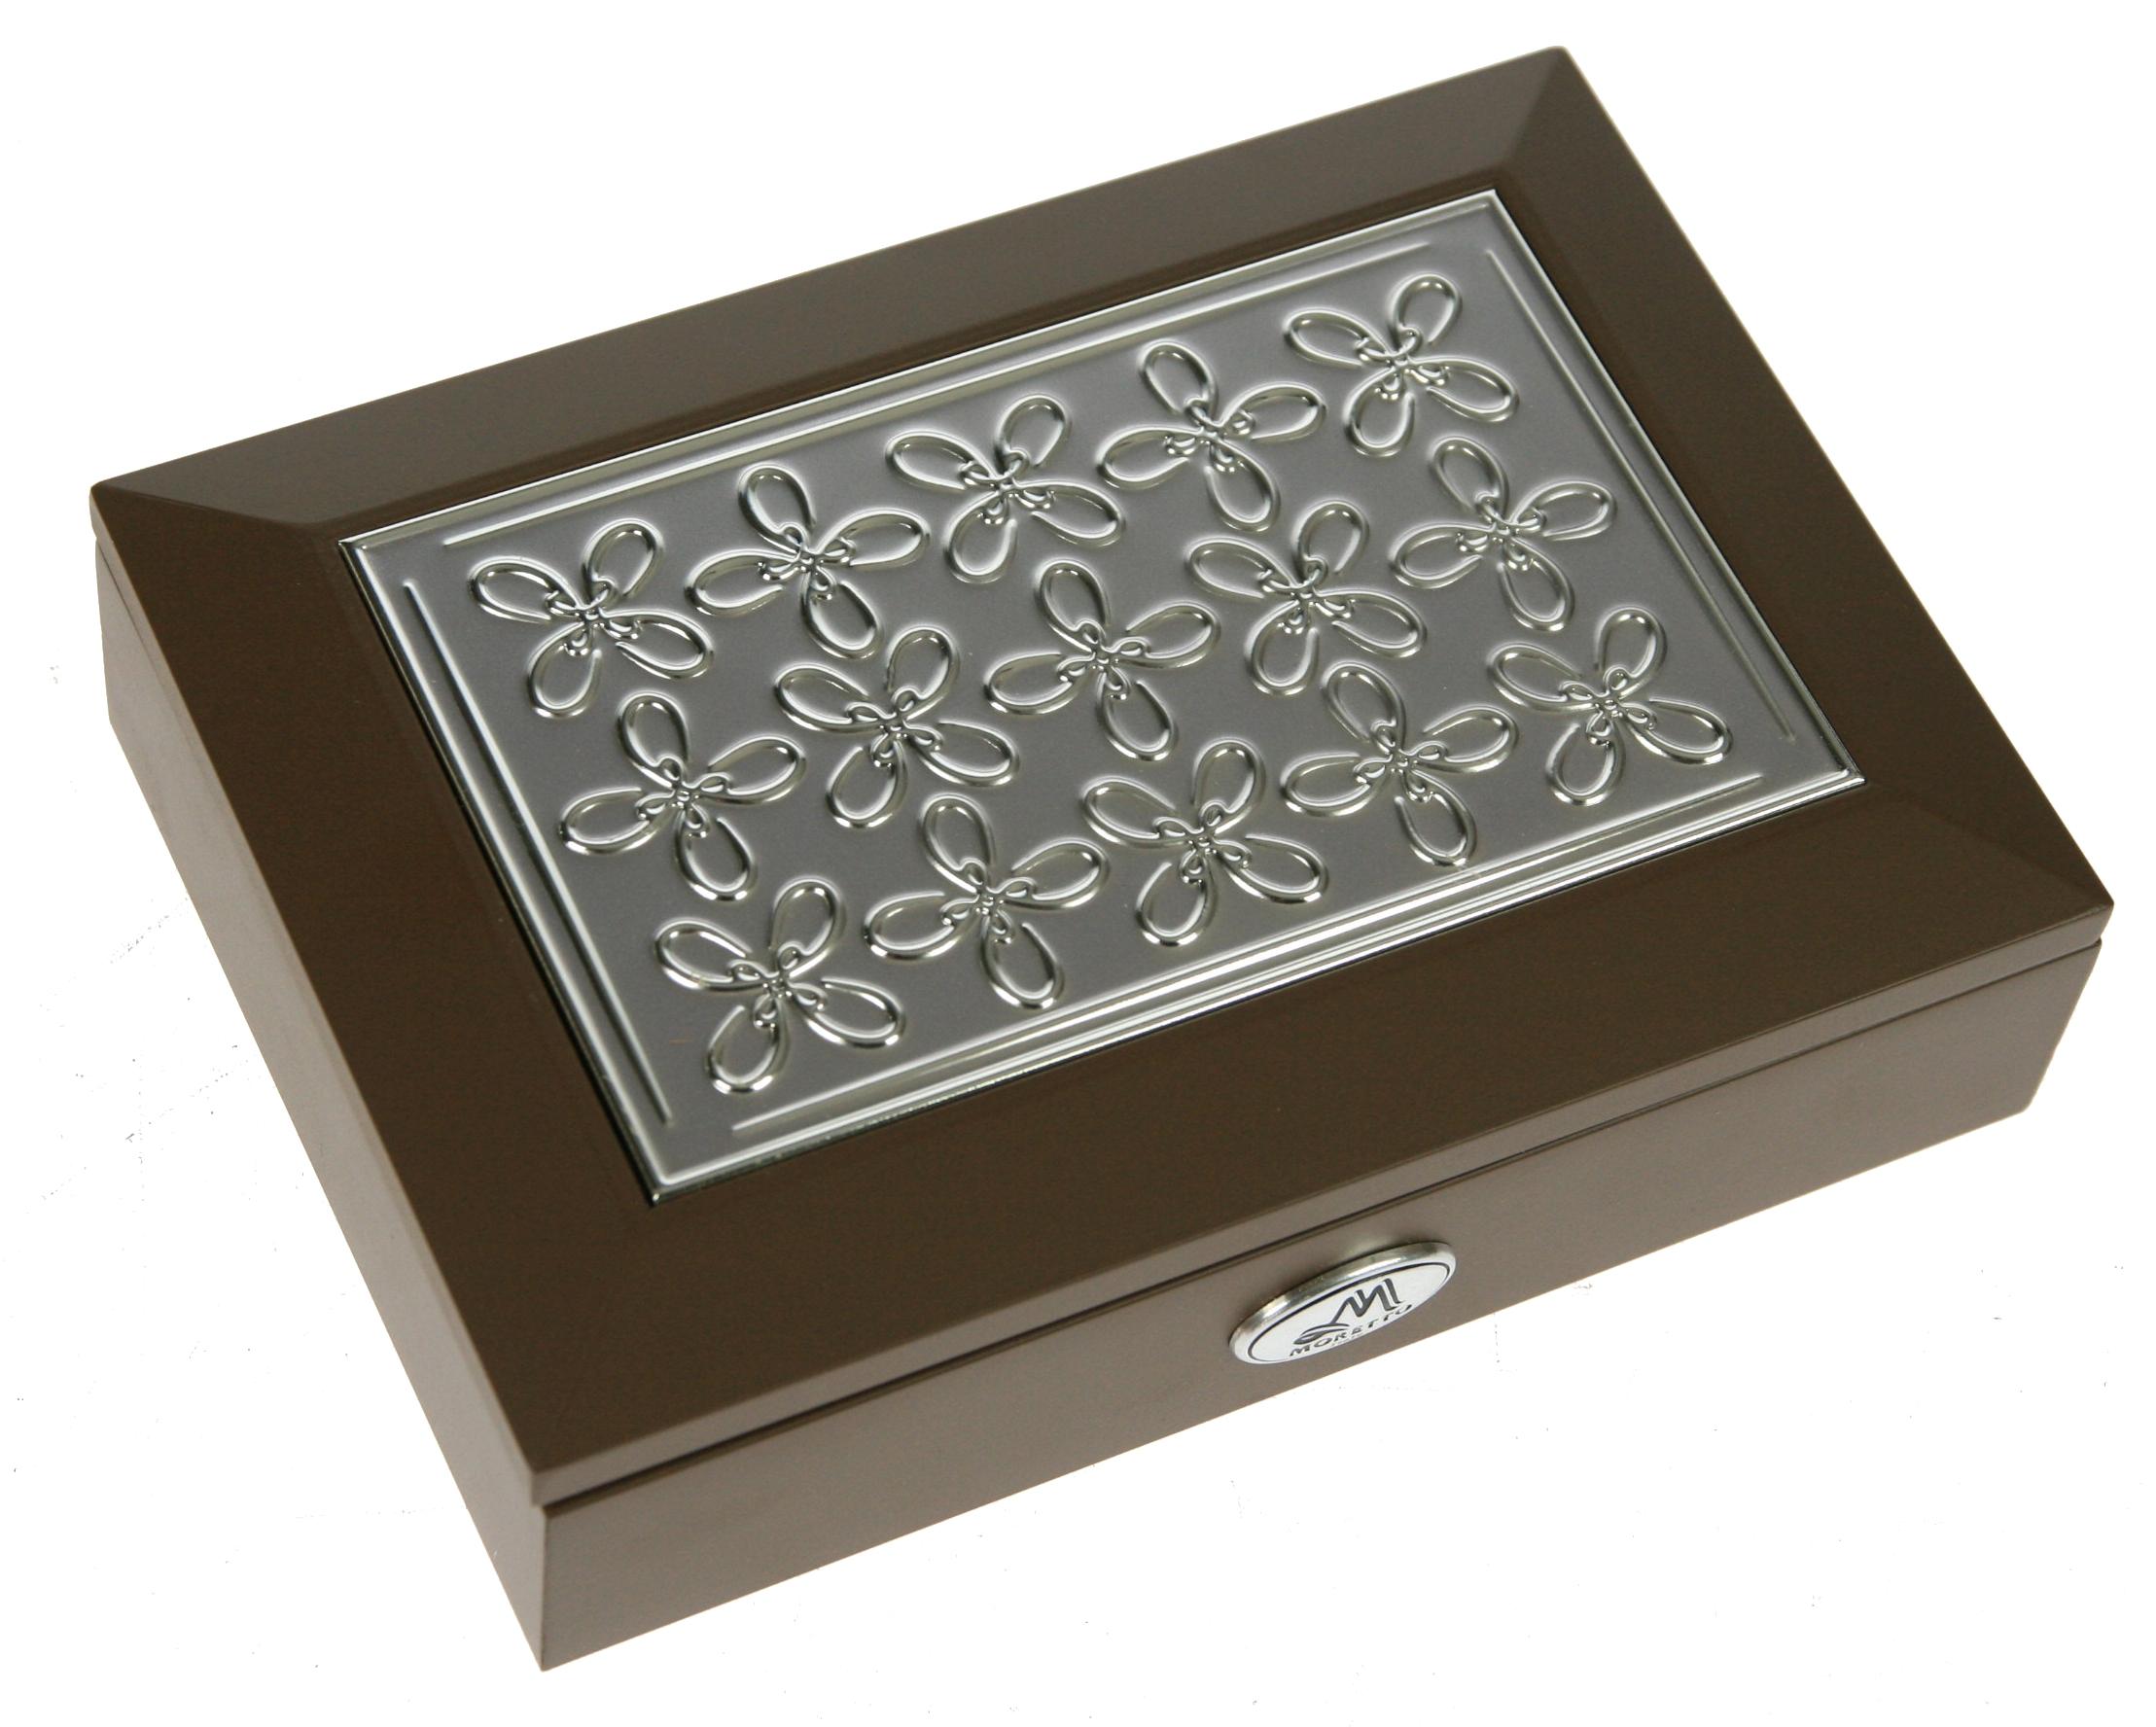 Шкатулка для ювелирных украшений Moretto, 18 х 13 х 5 см. 39941 шкатулка для ювелирных украшений moretto 18 х 13 х 5 см 39849